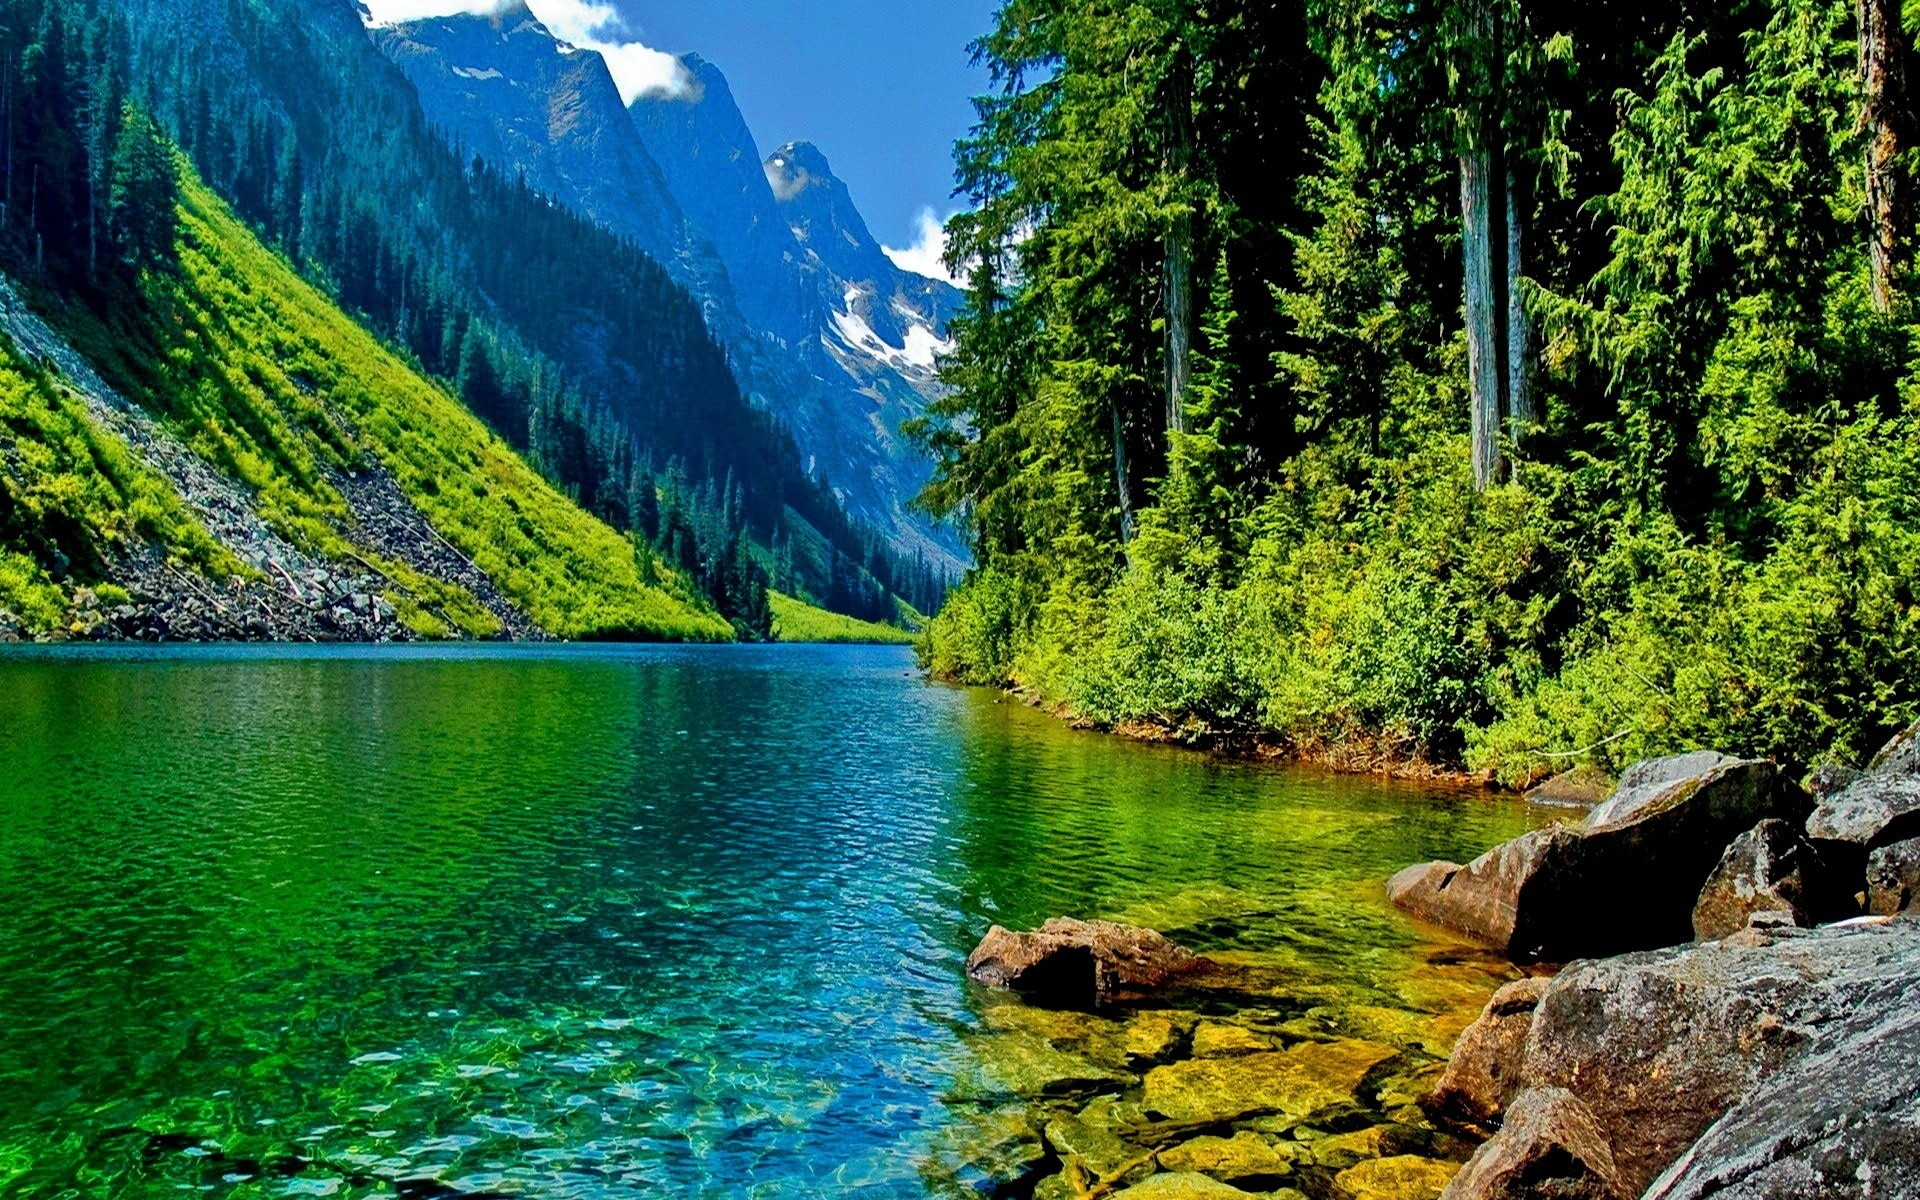 landscape mountain river HD Desktop Wallpaper | HD Desktop Wallpaper .